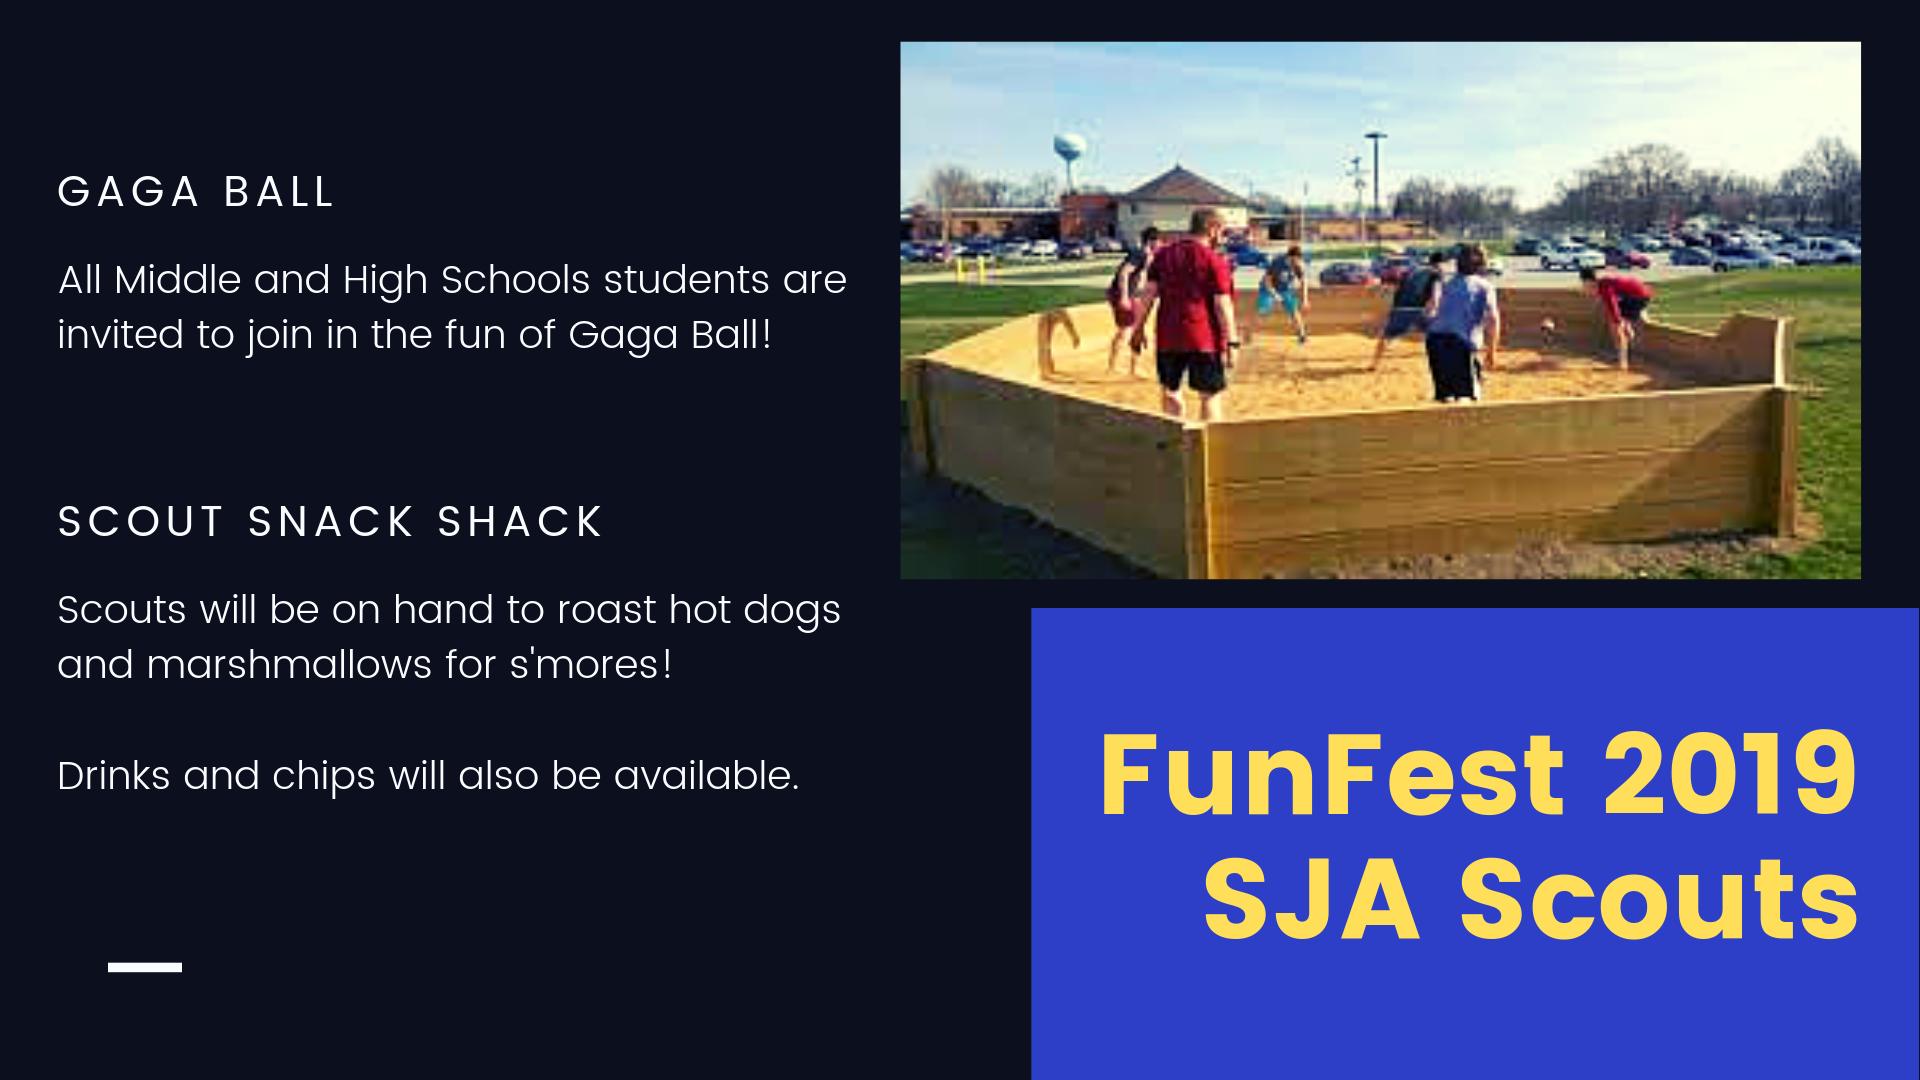 FunFest 2019 SJA Scouts.png